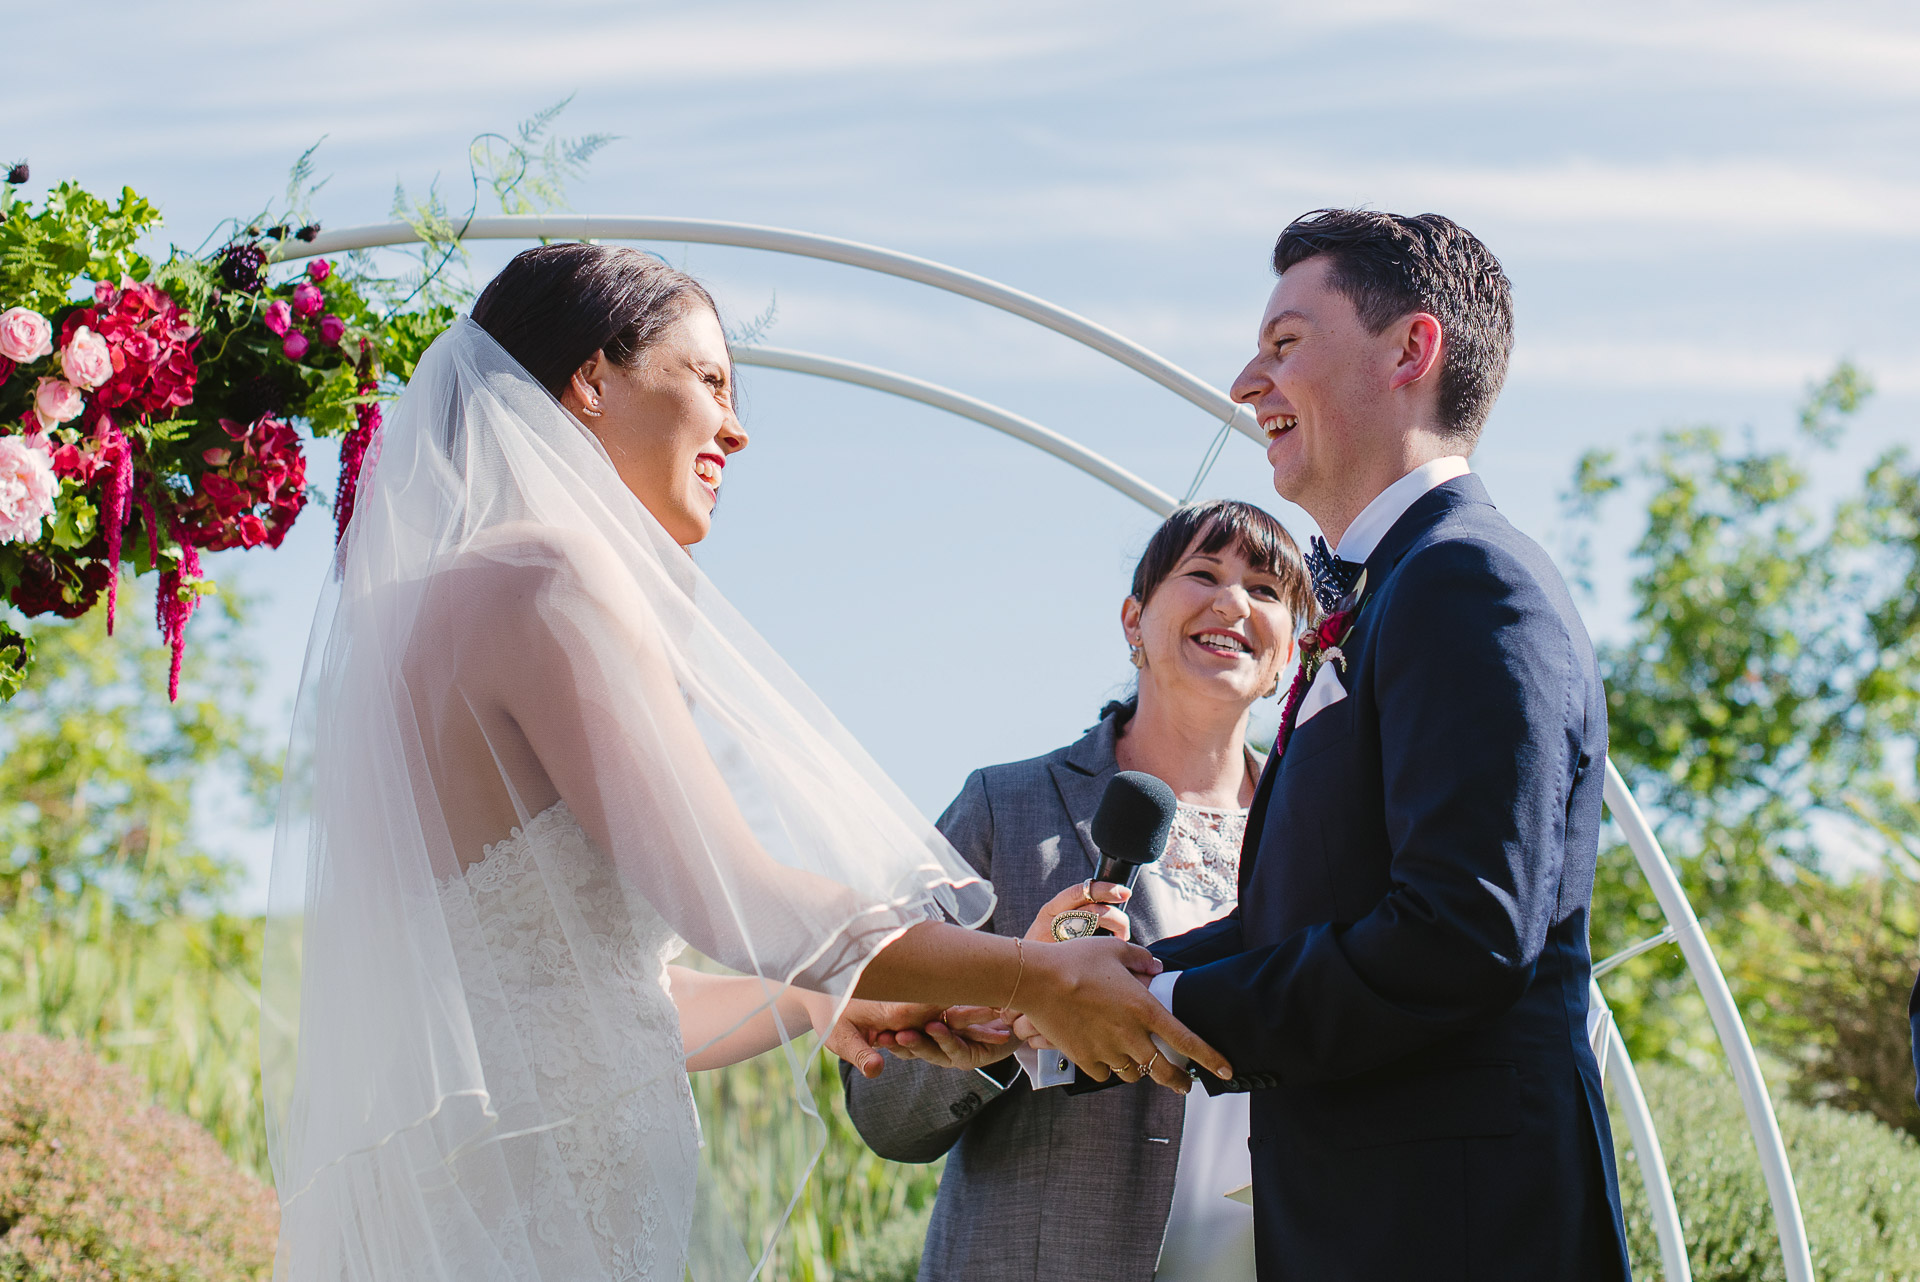 Marriage Celebrant Camille Abbott